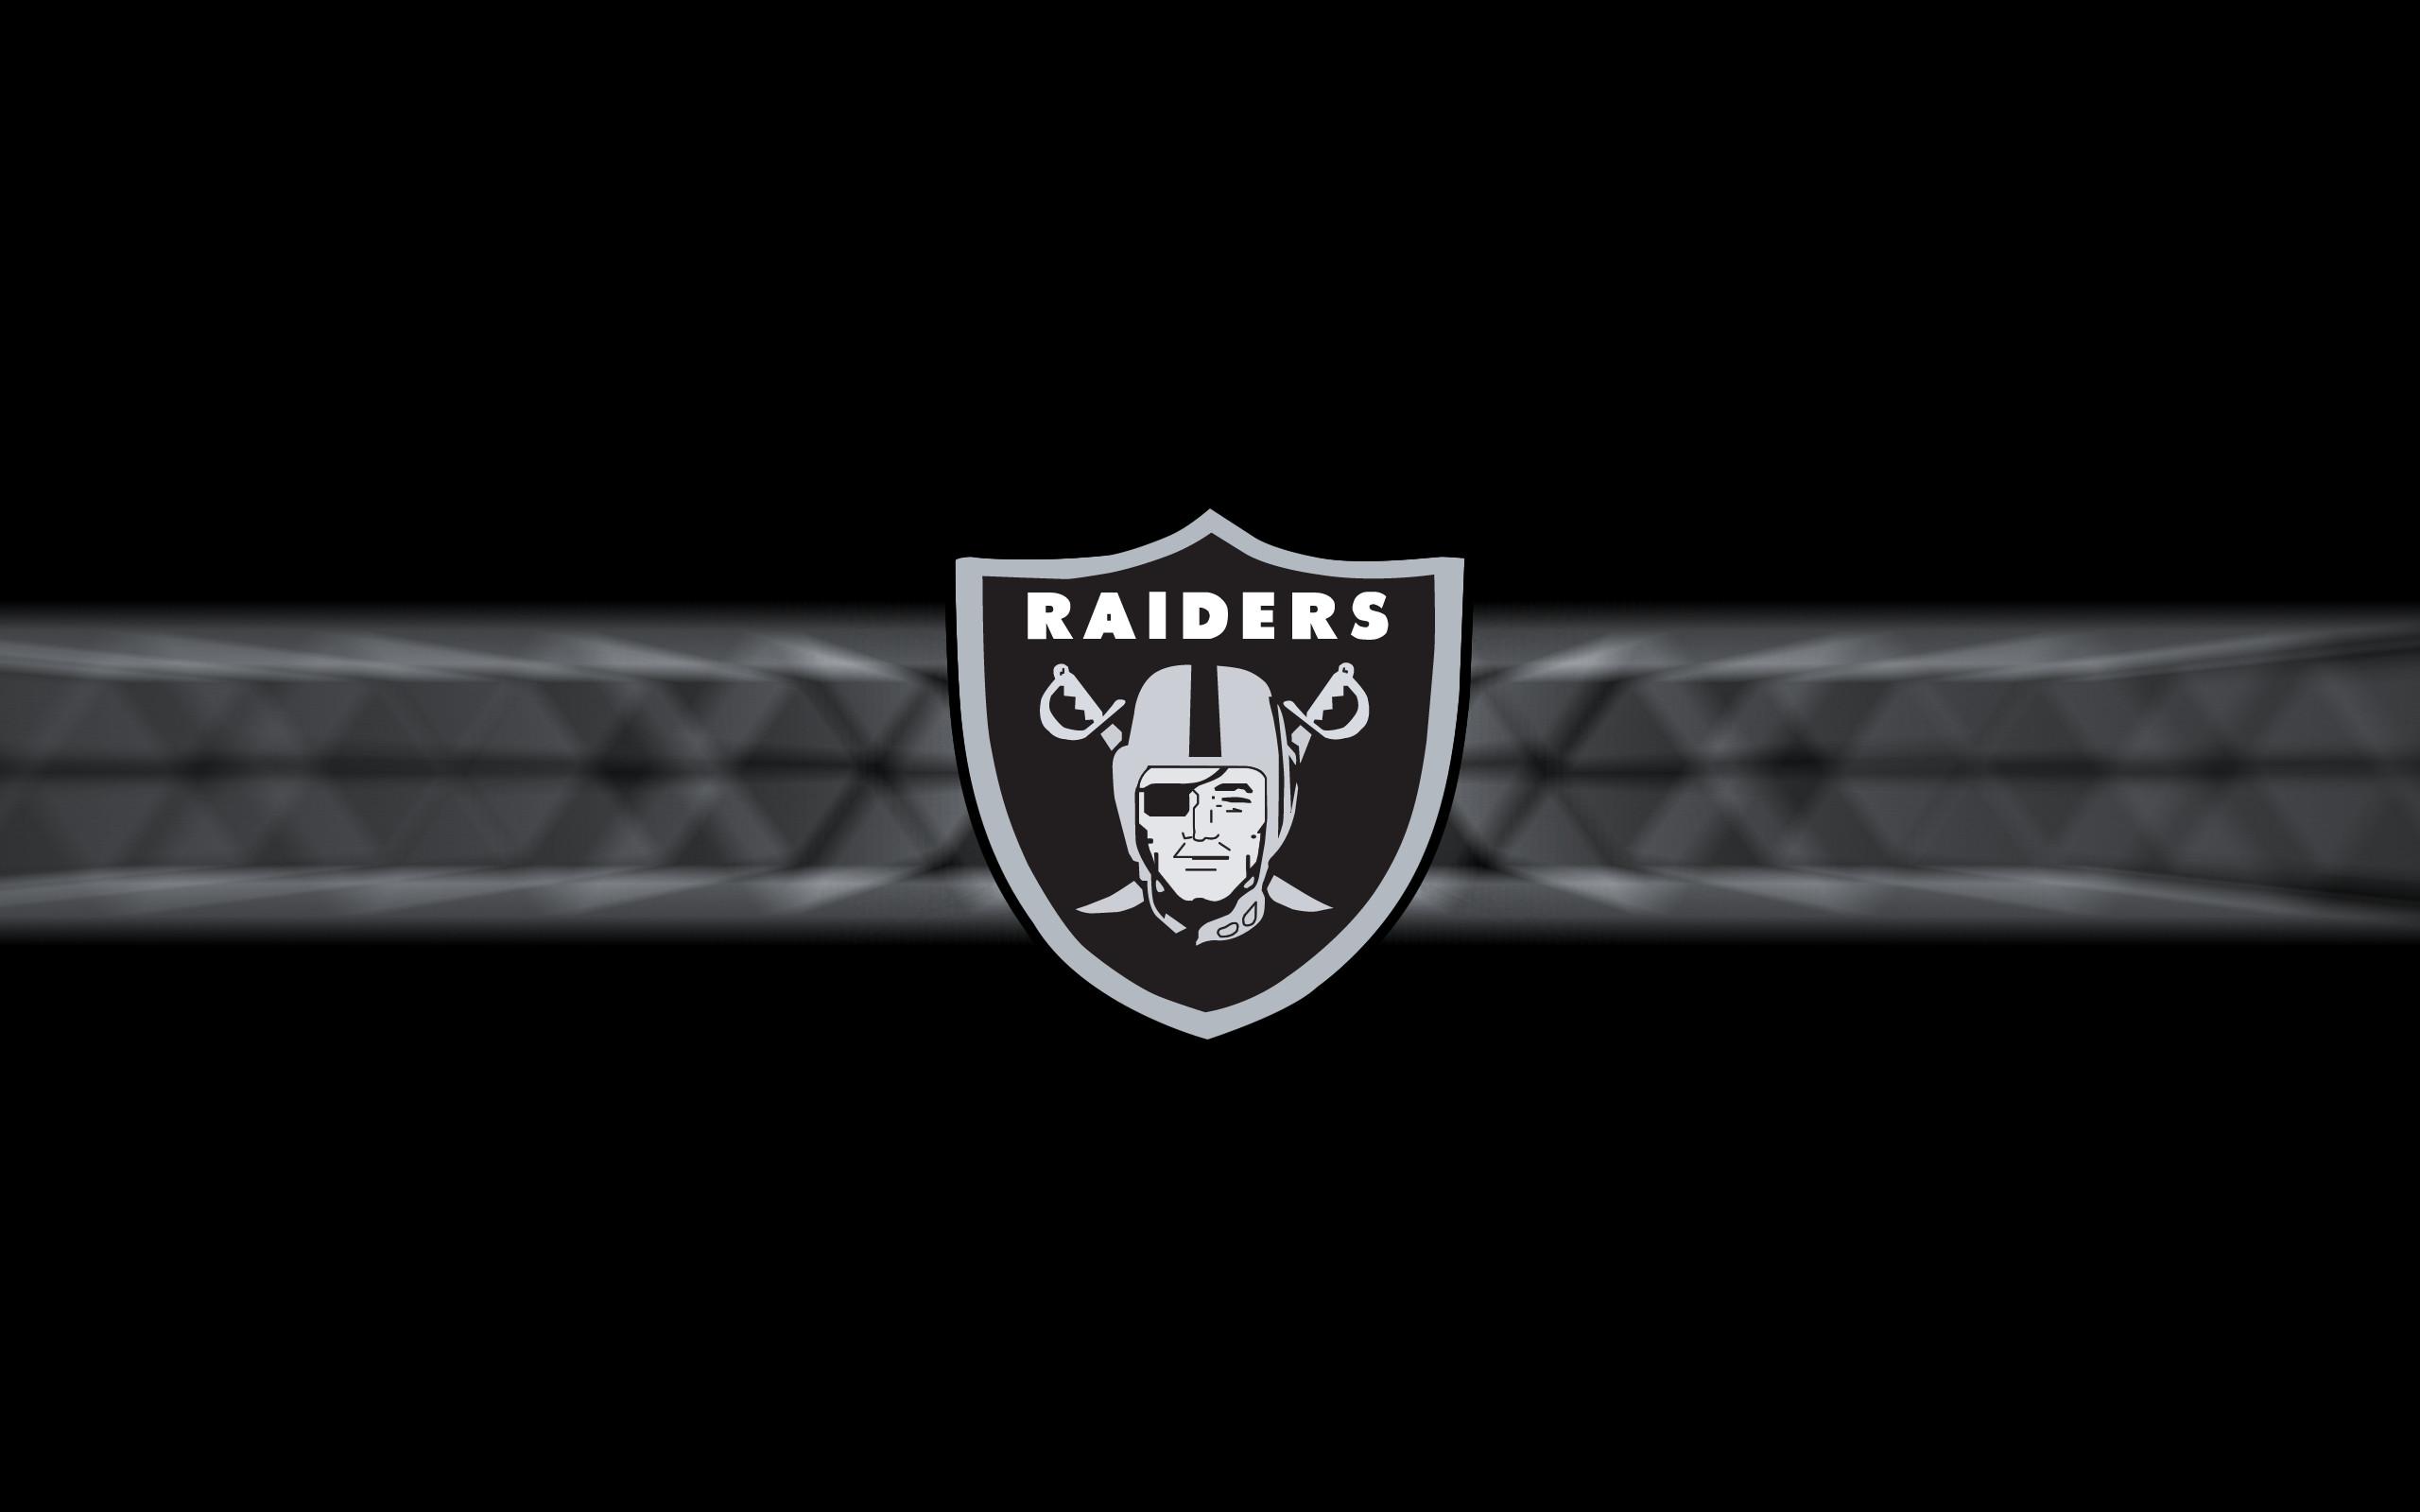 best ideas about Raiders wallpaper on Pinterest Image raider